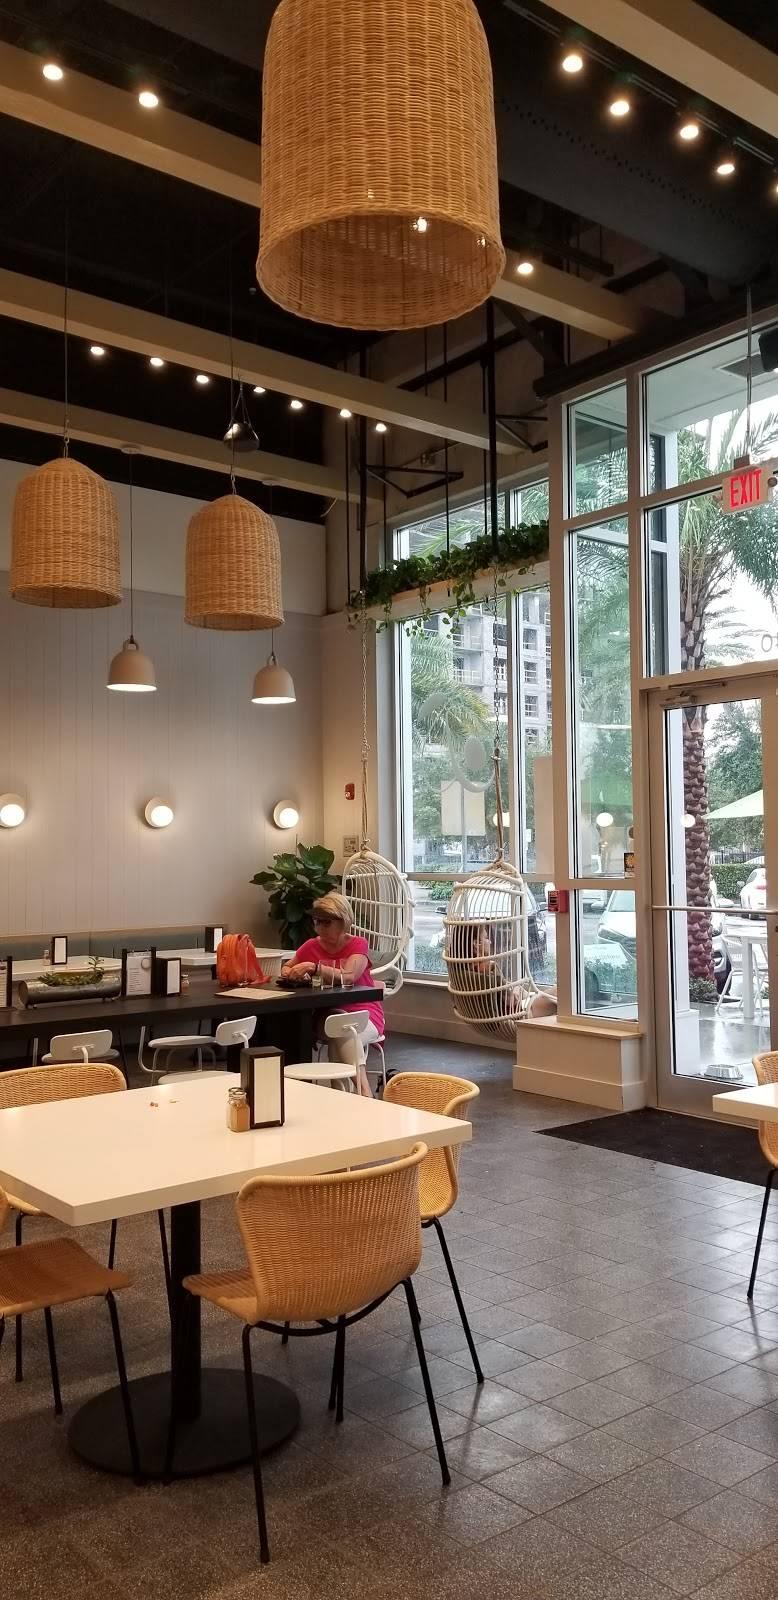 Rawk Star Cafe St. Pete   restaurant   740 Central Ave, St. Petersburg, FL 33701, USA   7274406026 OR +1 727-440-6026